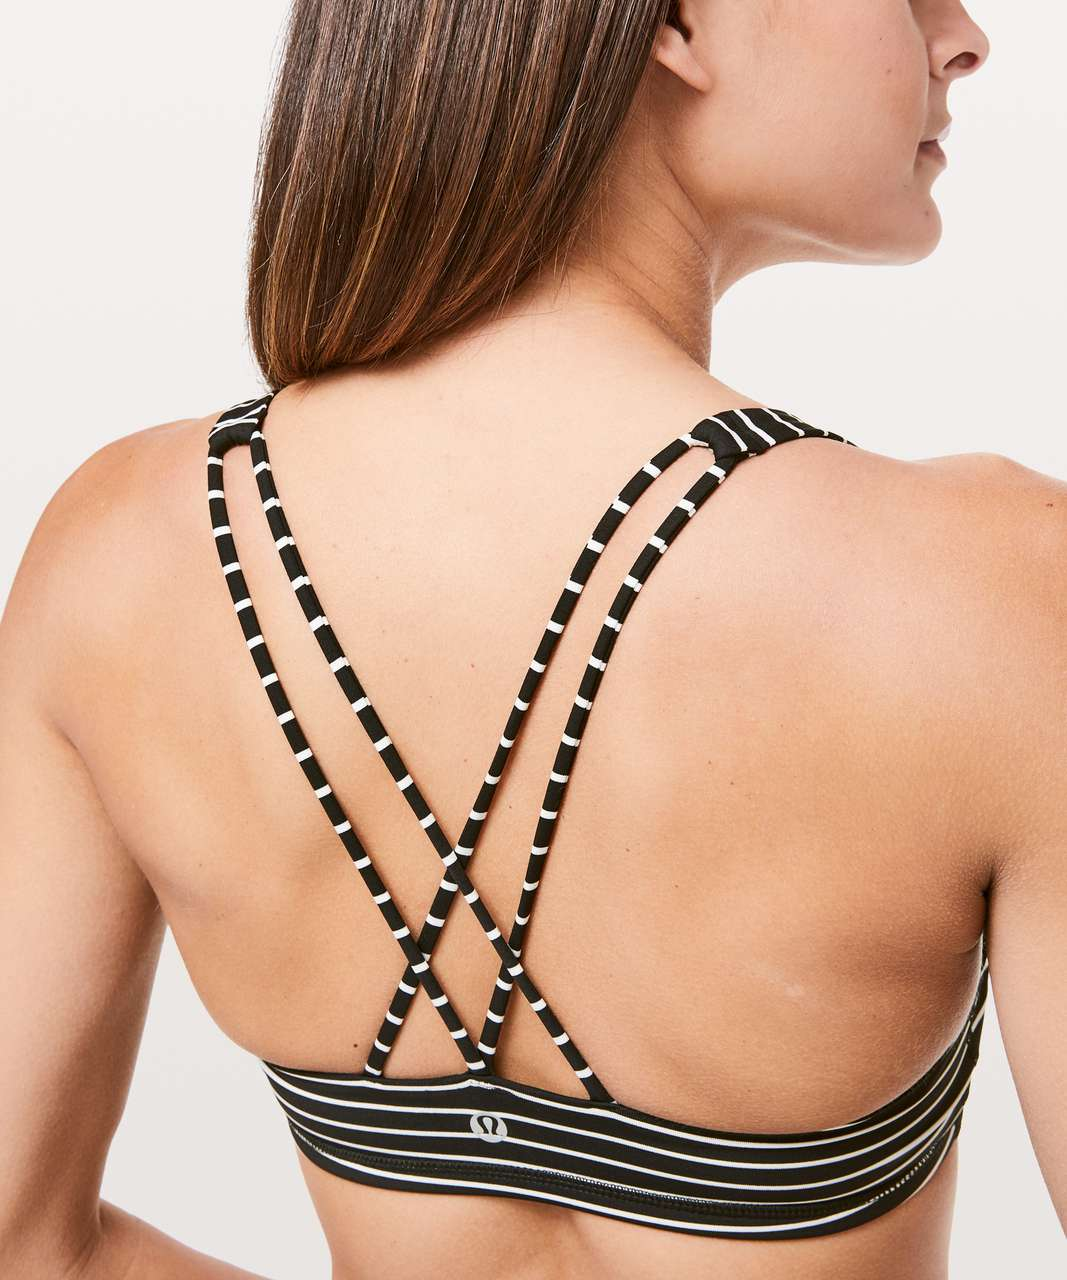 Lululemon Free To Be Bra - Parallel Stripe Black White